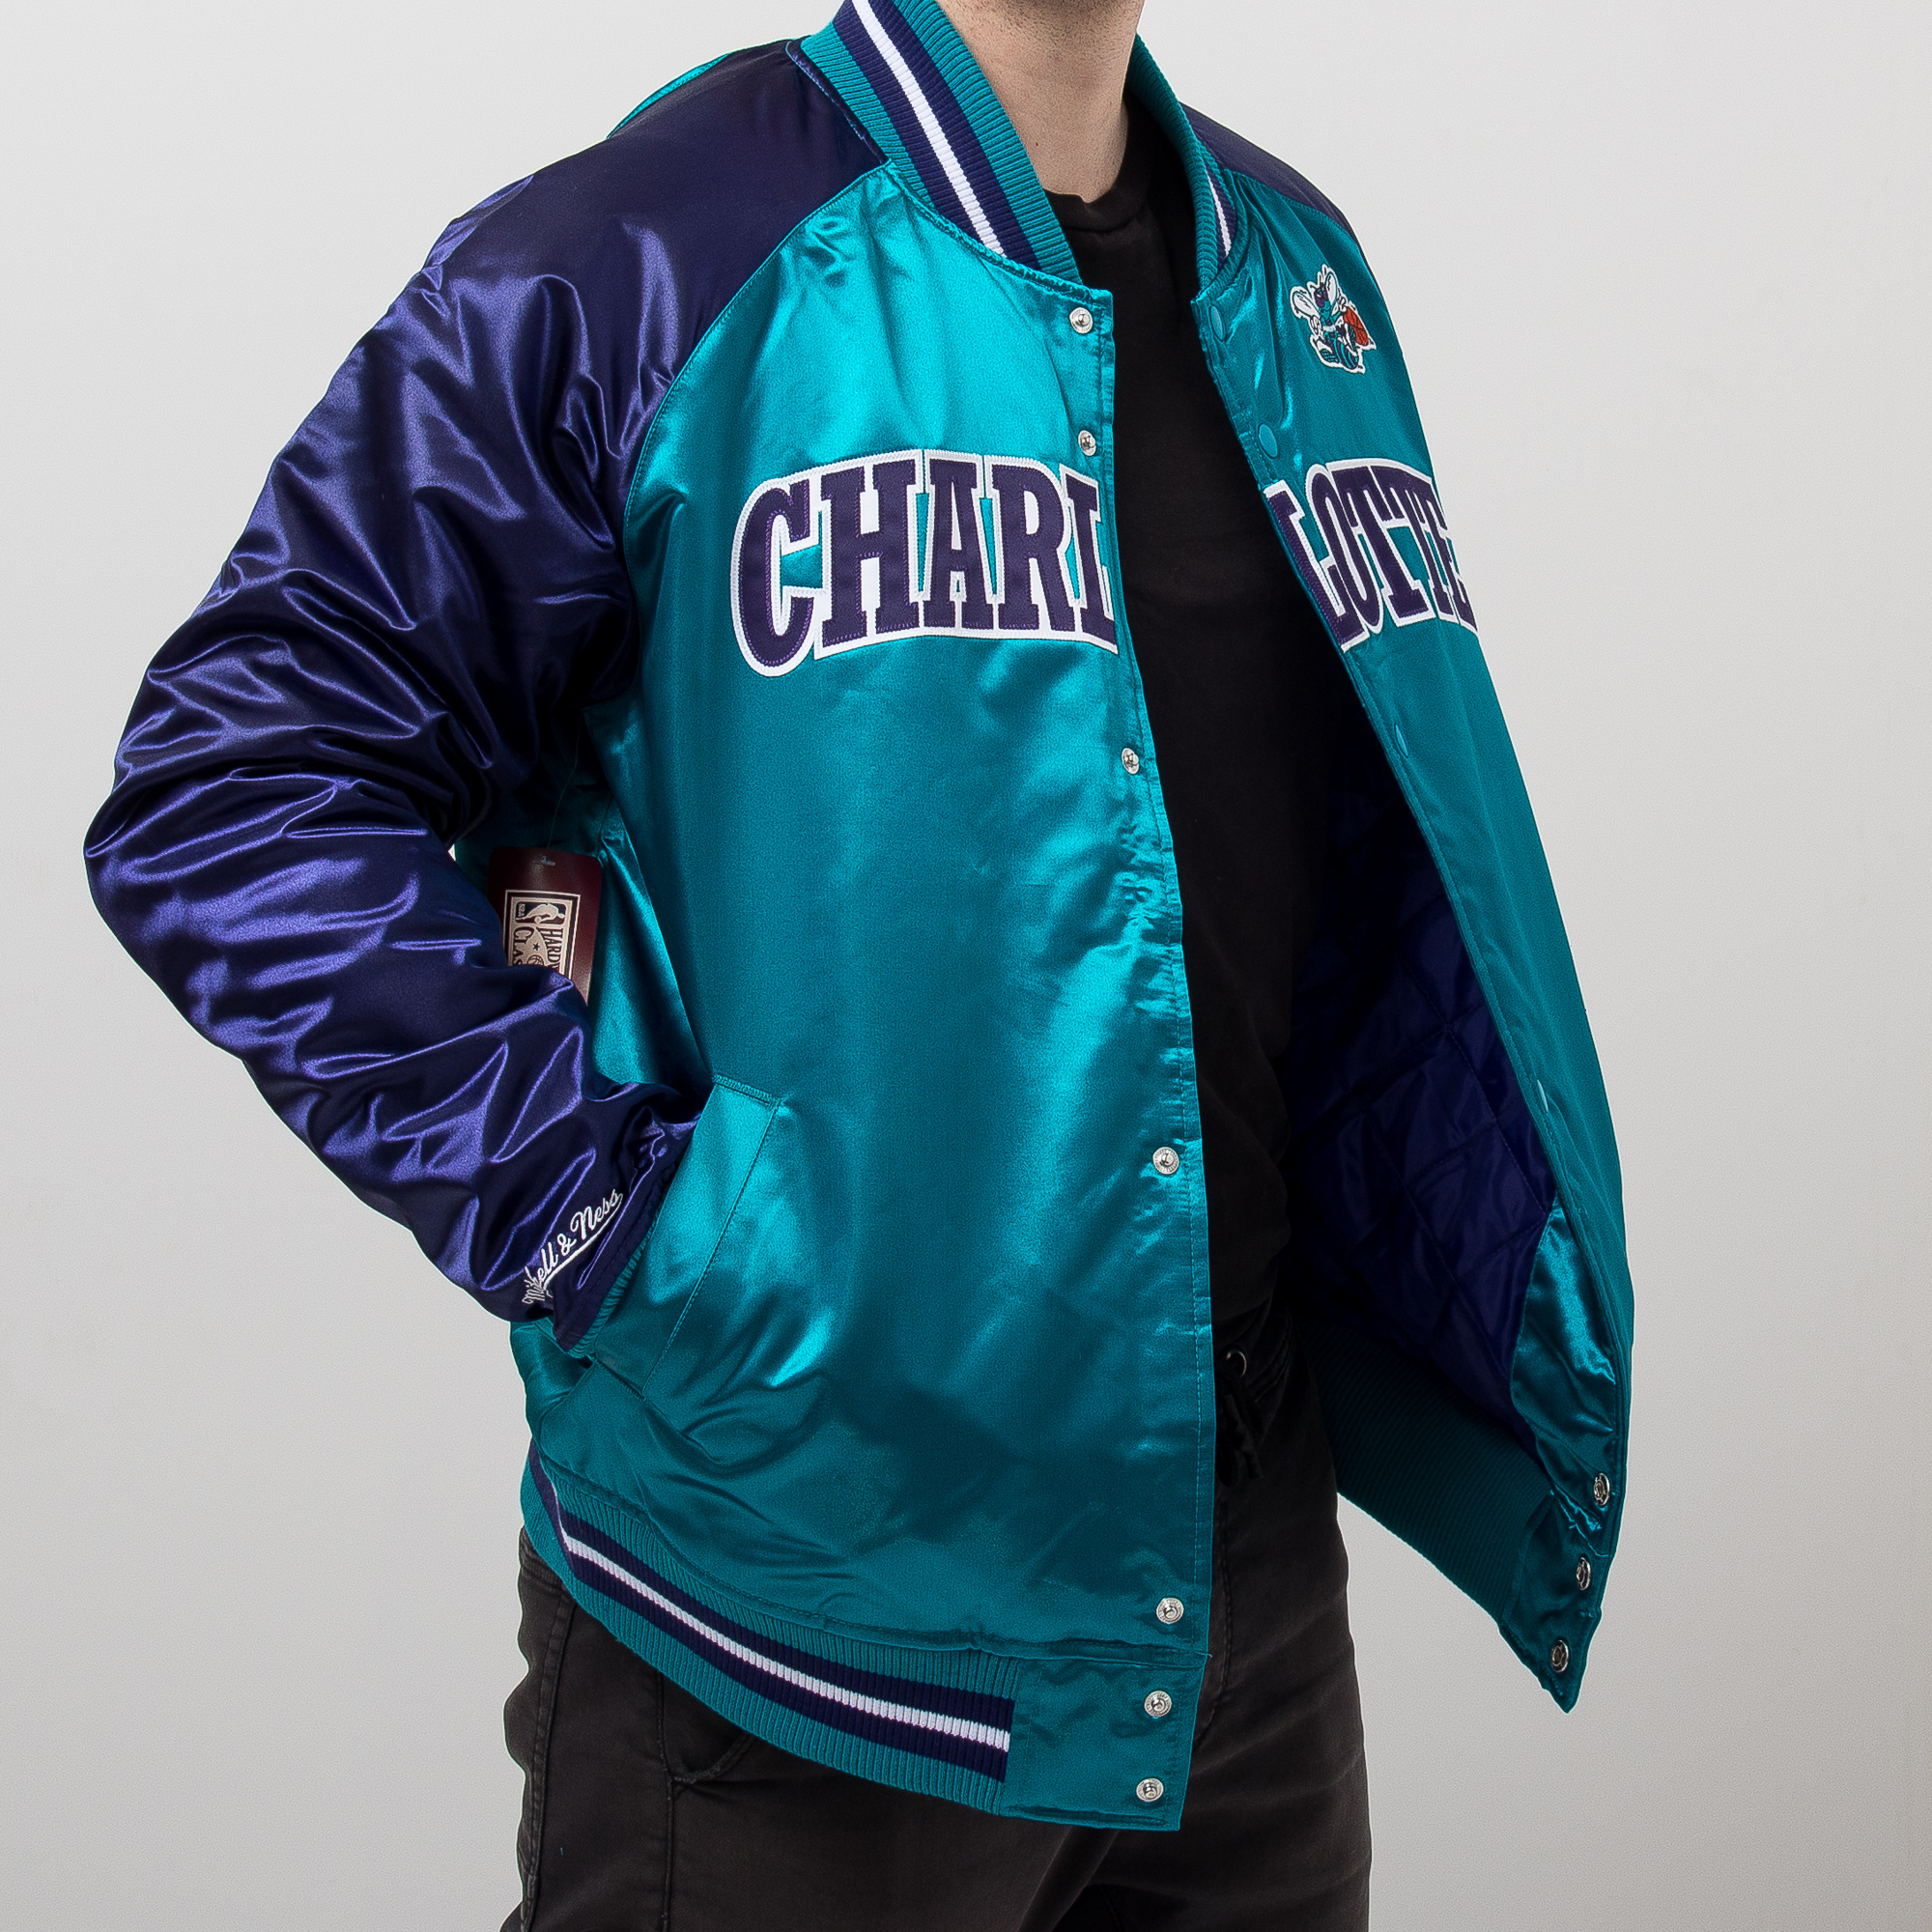 new arrival d33d8 2df7a Mitchell & Ness NBA Charlotte Hornets Tough Season Satin ...